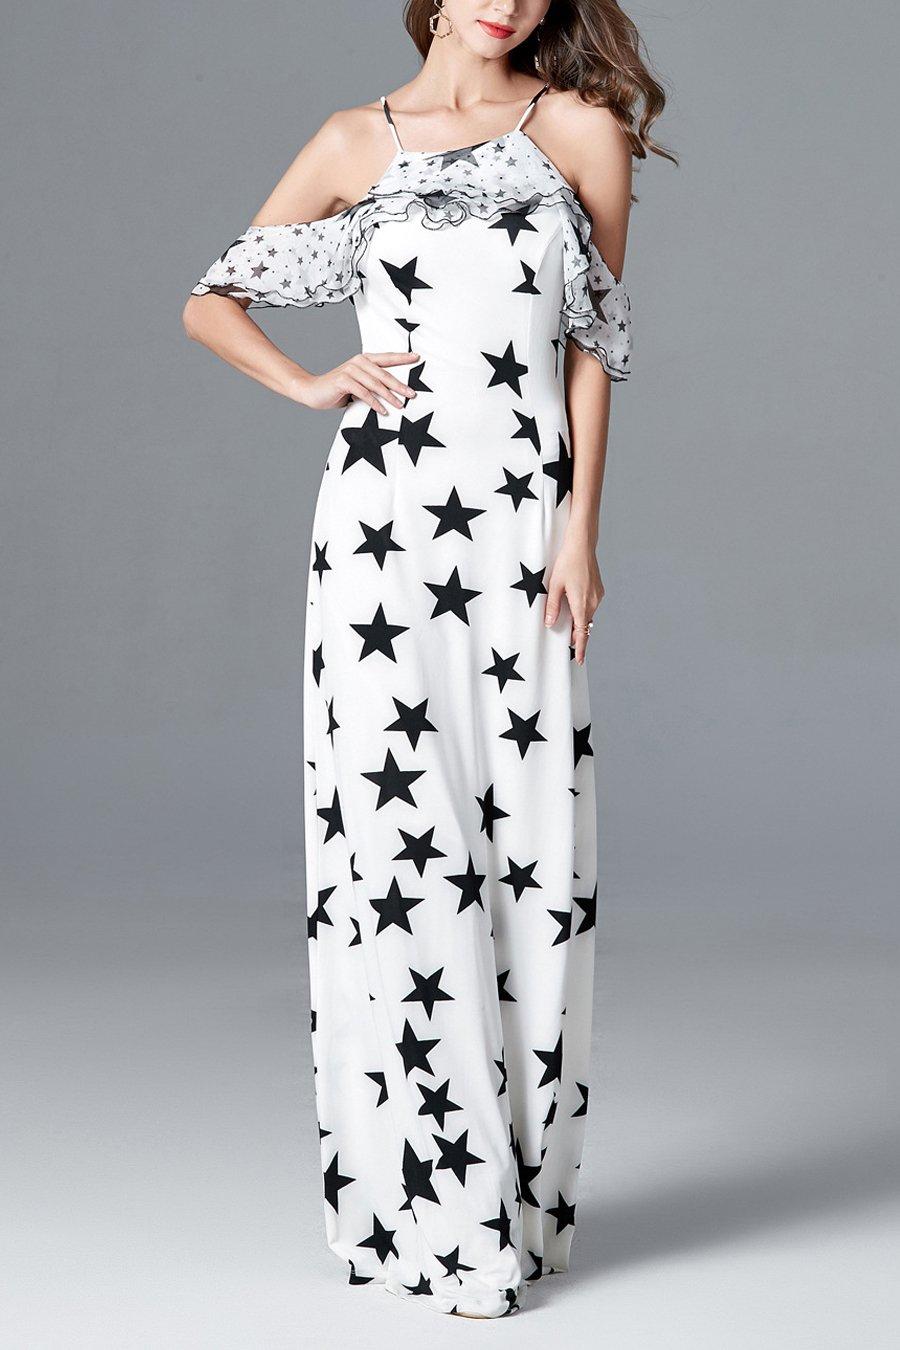 Sheath Boho Star Printed Long Party Formal Dress